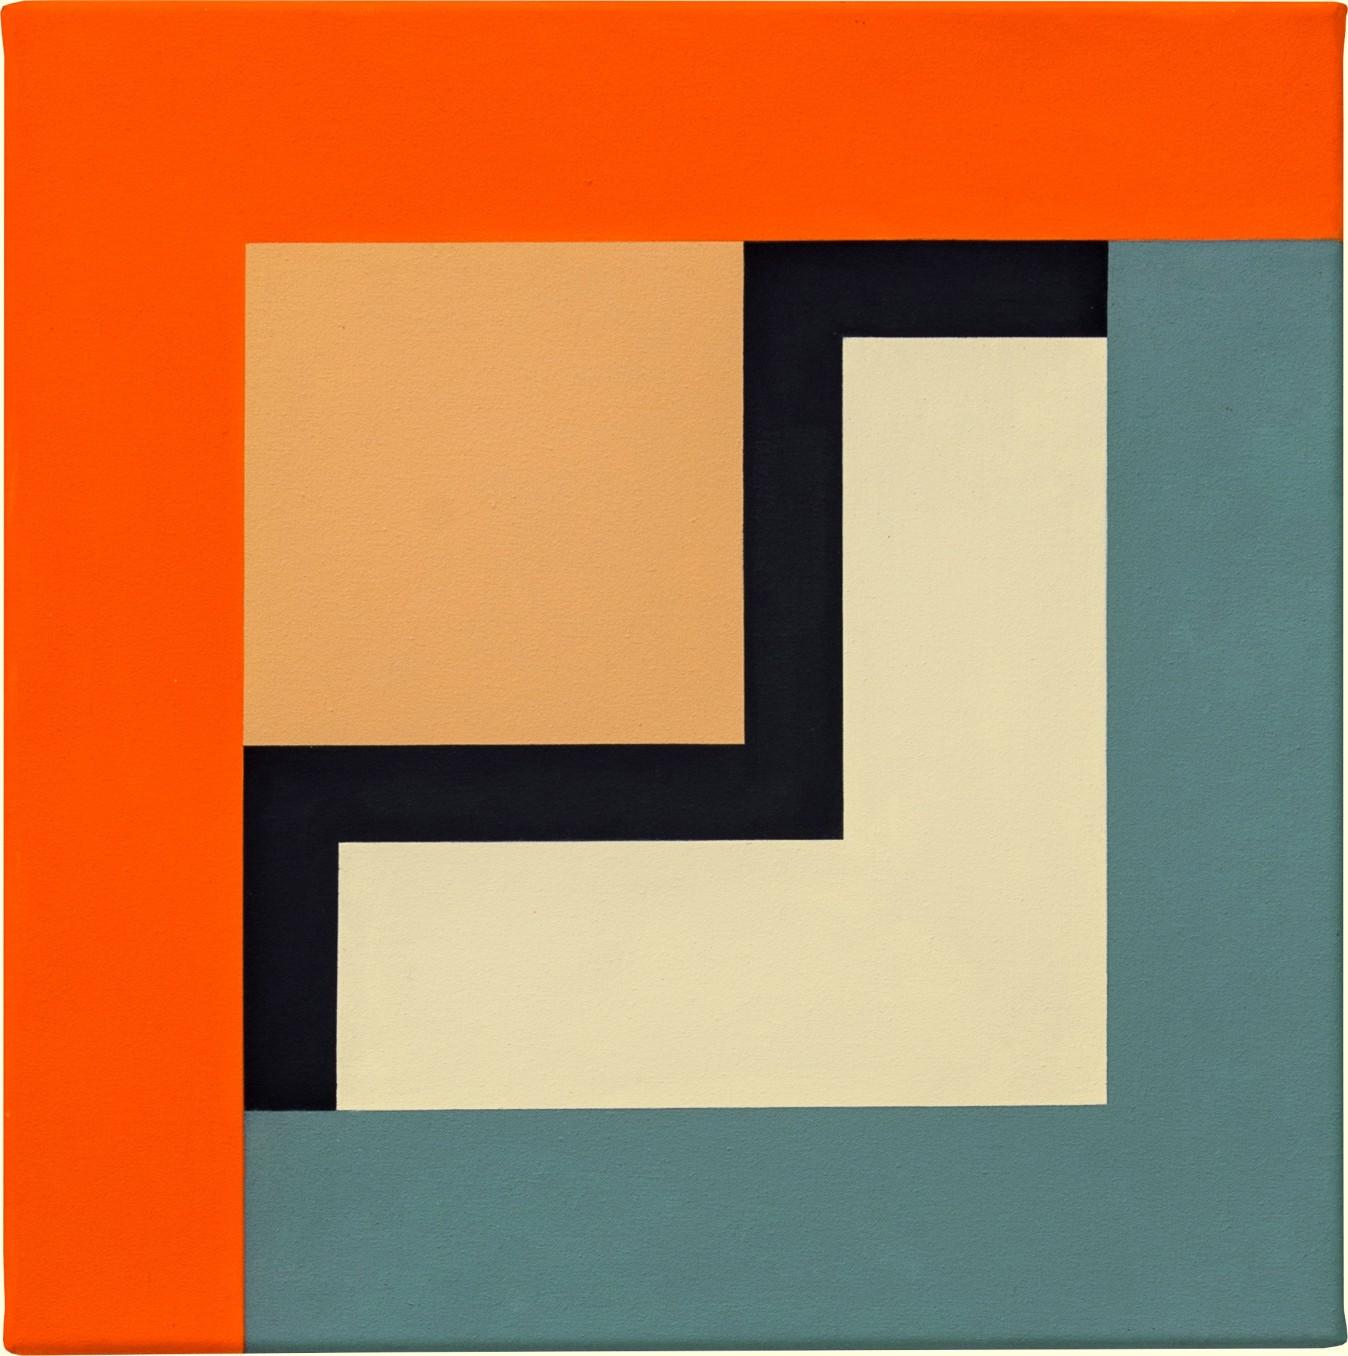 Mary Webb, UTAH IX, 2013, Oil on canvas, 45 x 45 cm, 17 3/4 x 17 3/4 in, Framed: 54.5 x 54.5 x 4 cm, 21 1/2 x 21 1/2 x 1 5/8 in